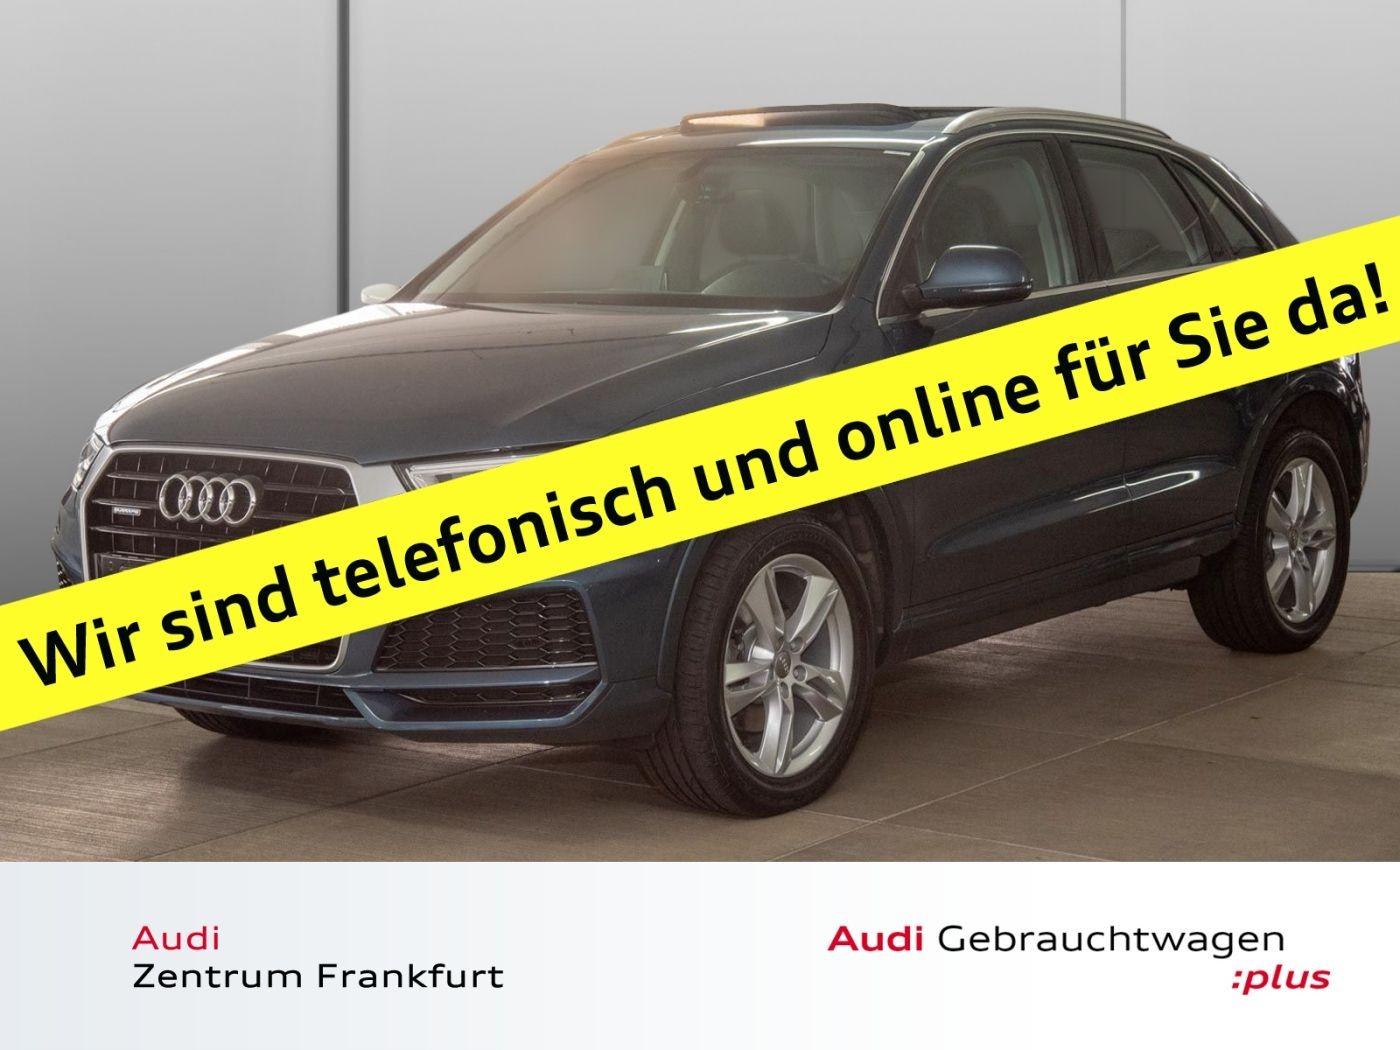 Audi Q3 2.0 TDI quattro S line Navi Panorama DAB Sitzheizung, Jahr 2017, Diesel